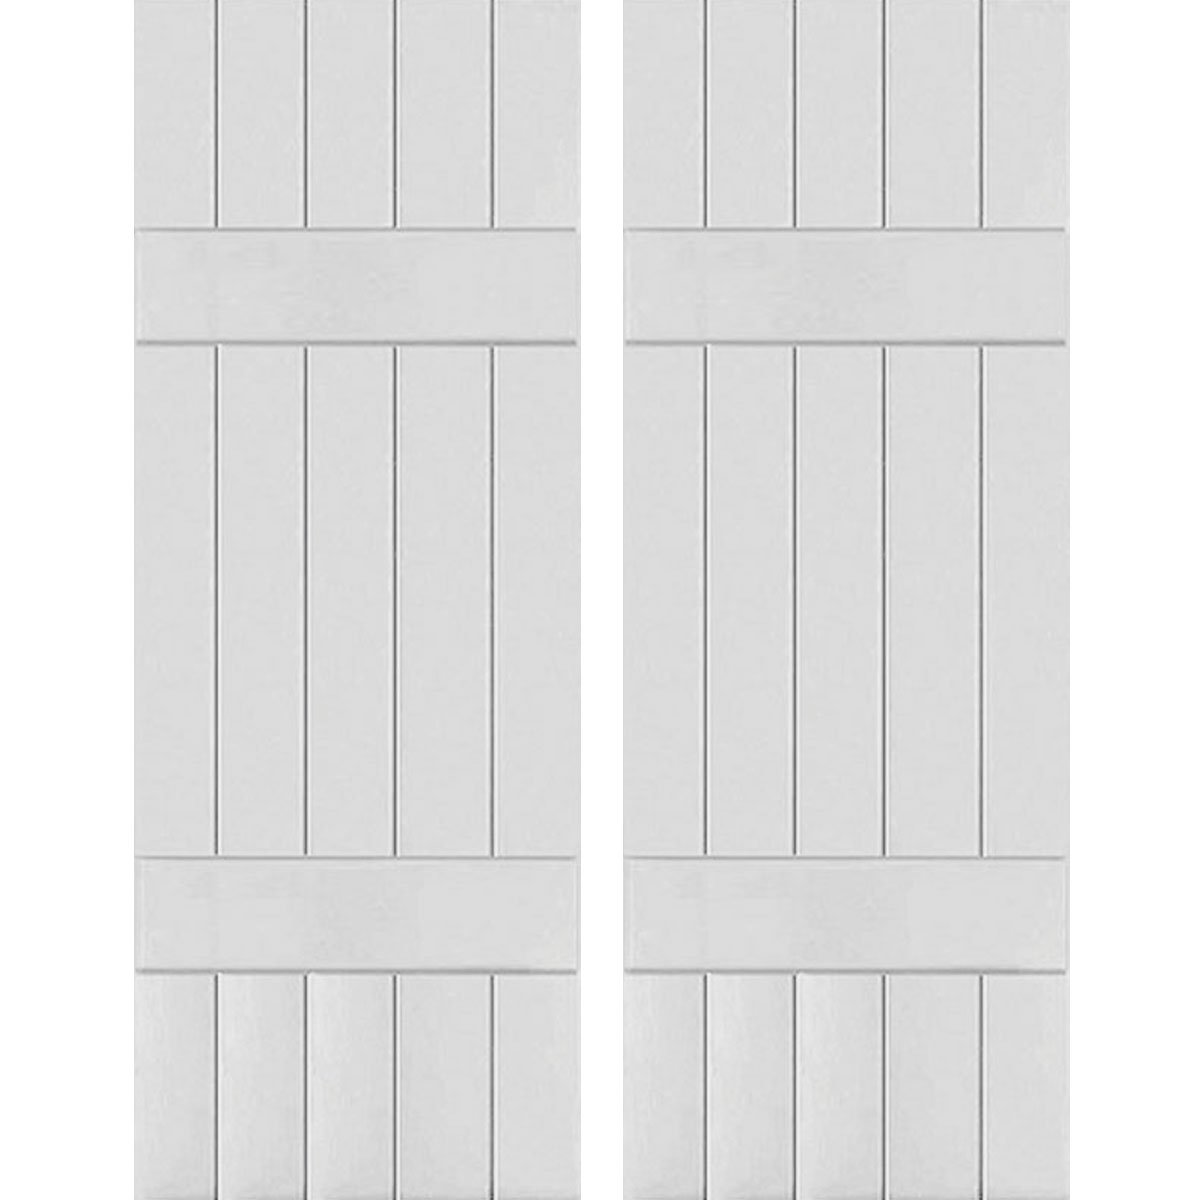 Ekena Millwork RWB18X048PRW Exterior Five Board Real Wood Western Red Cedar Board-n-Batten Shutters (Per Pair), 18'' x 48'', Primed by Ekena Millwork